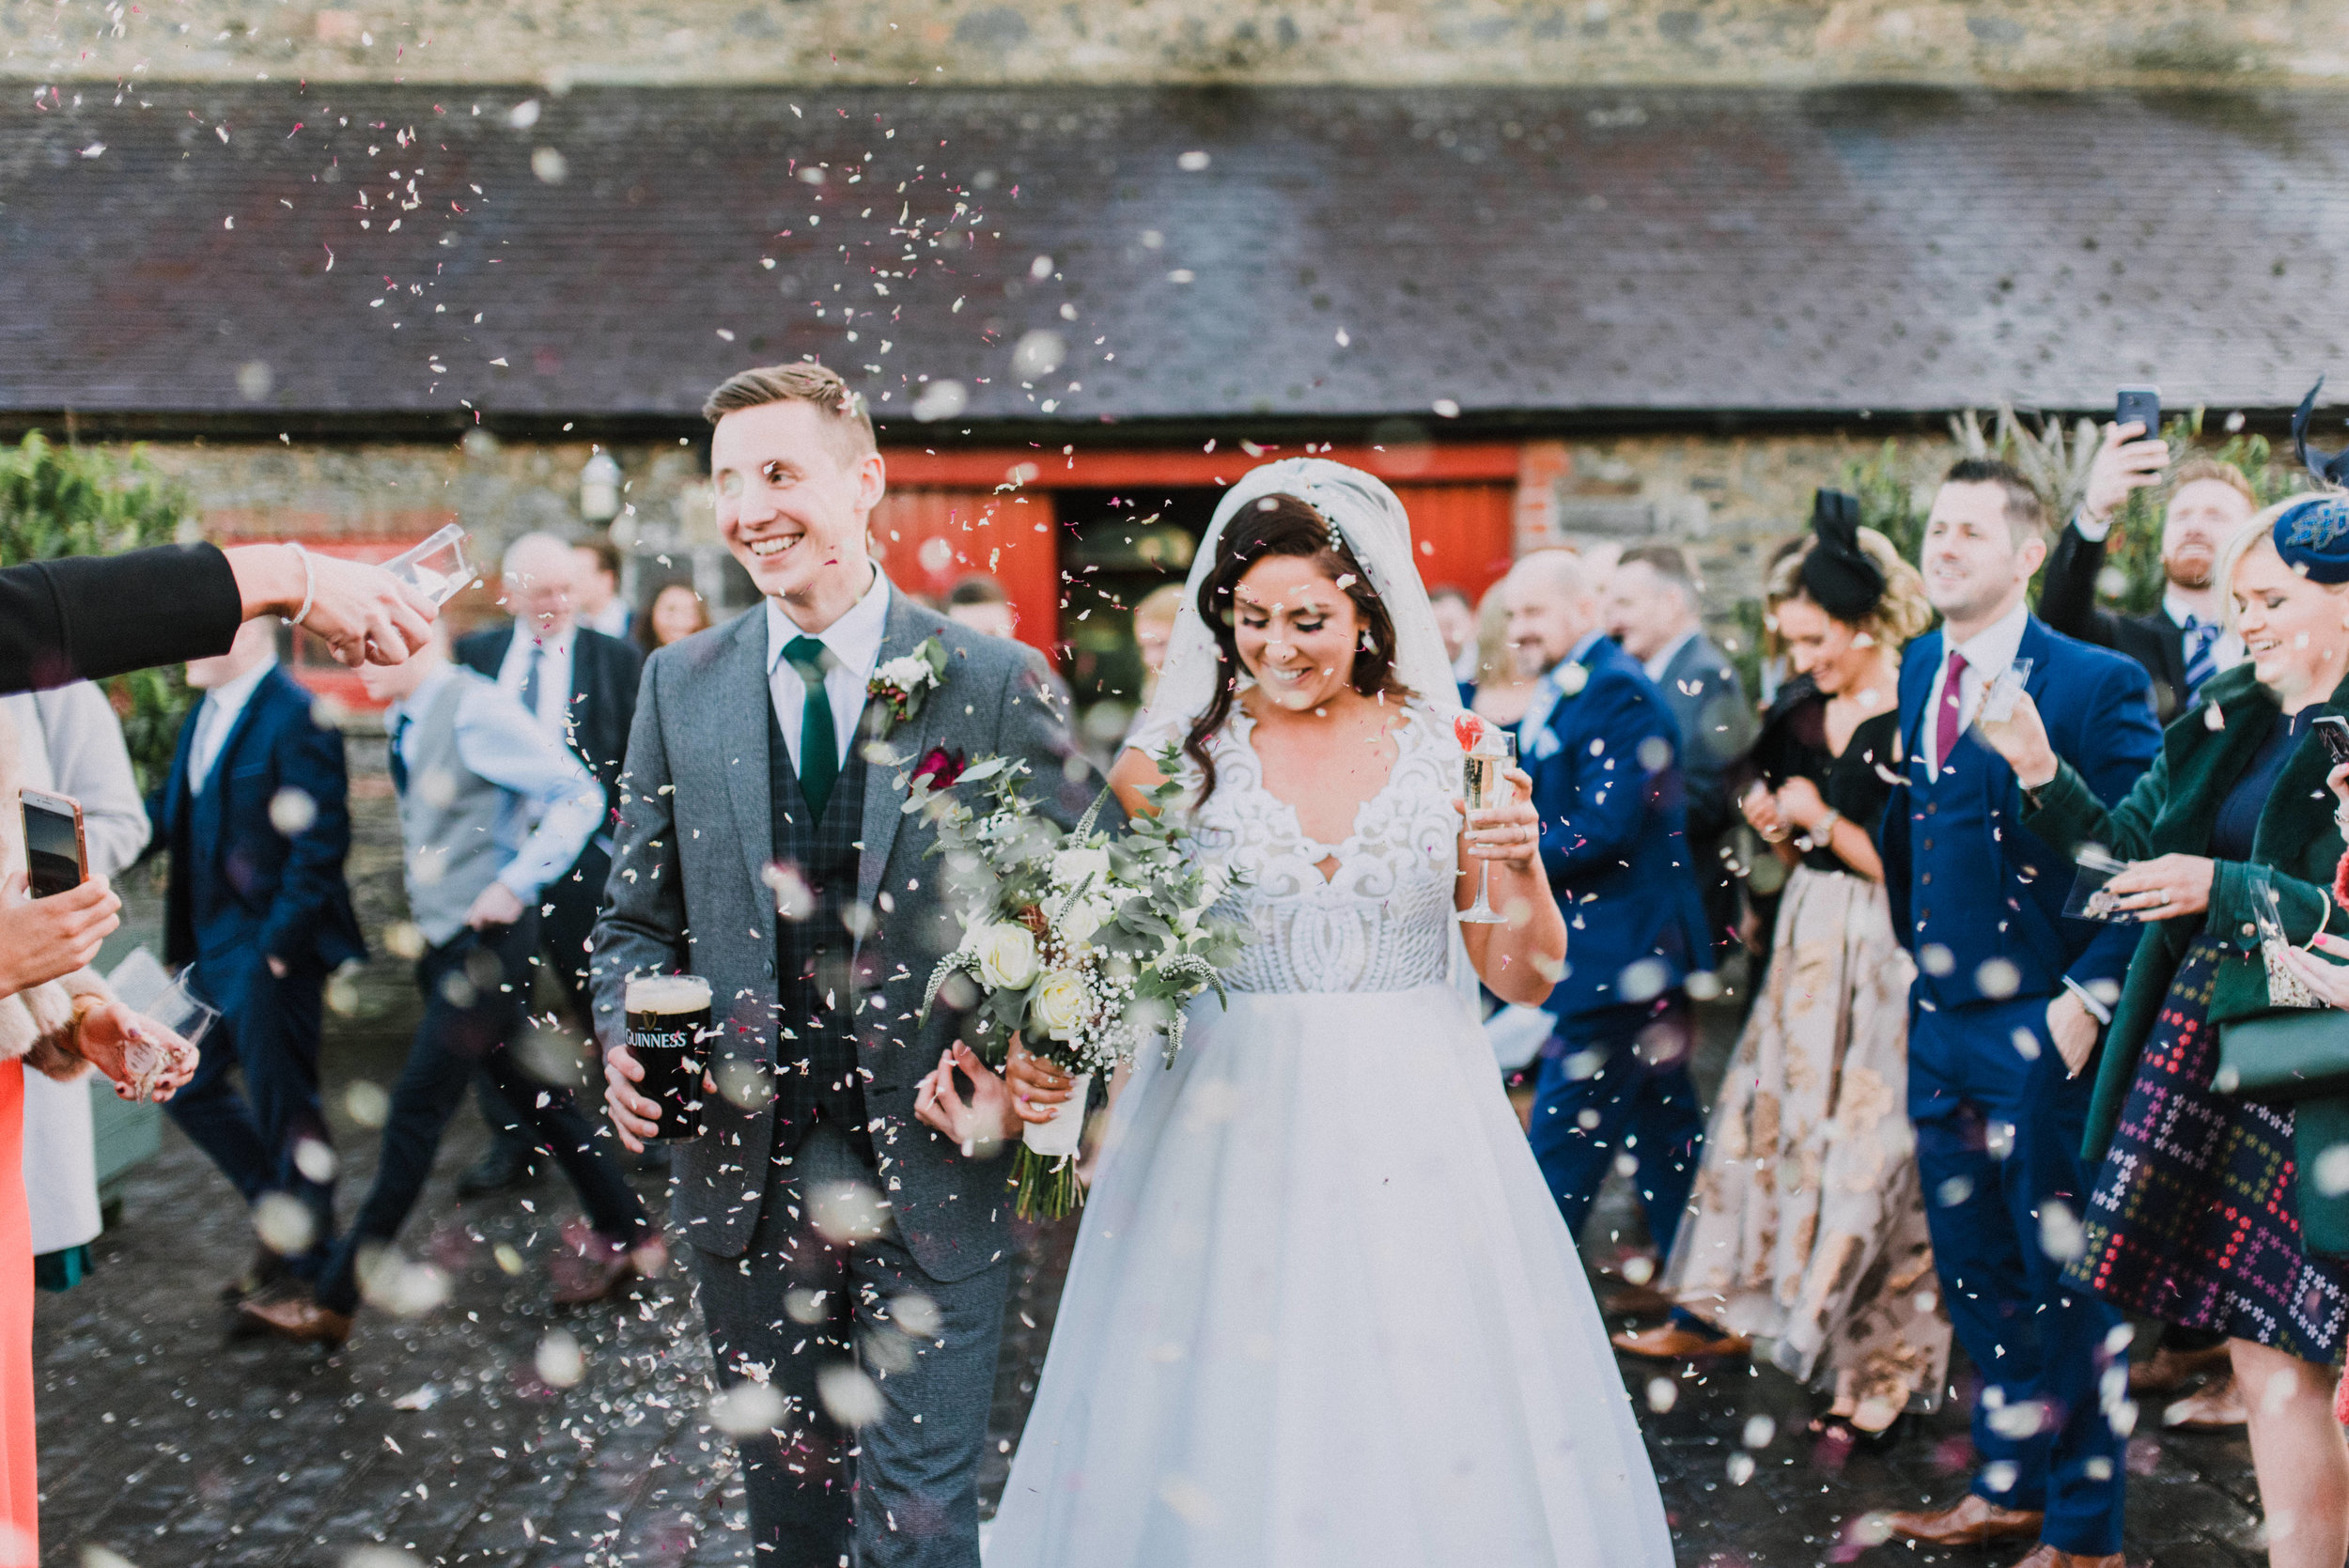 larchfield estate wedding, wedding venues northern ireland, barn wedding venues northern ireland, quirky weddings ni, wedding photos larchfield estate, shane todd's wedding (3).jpg